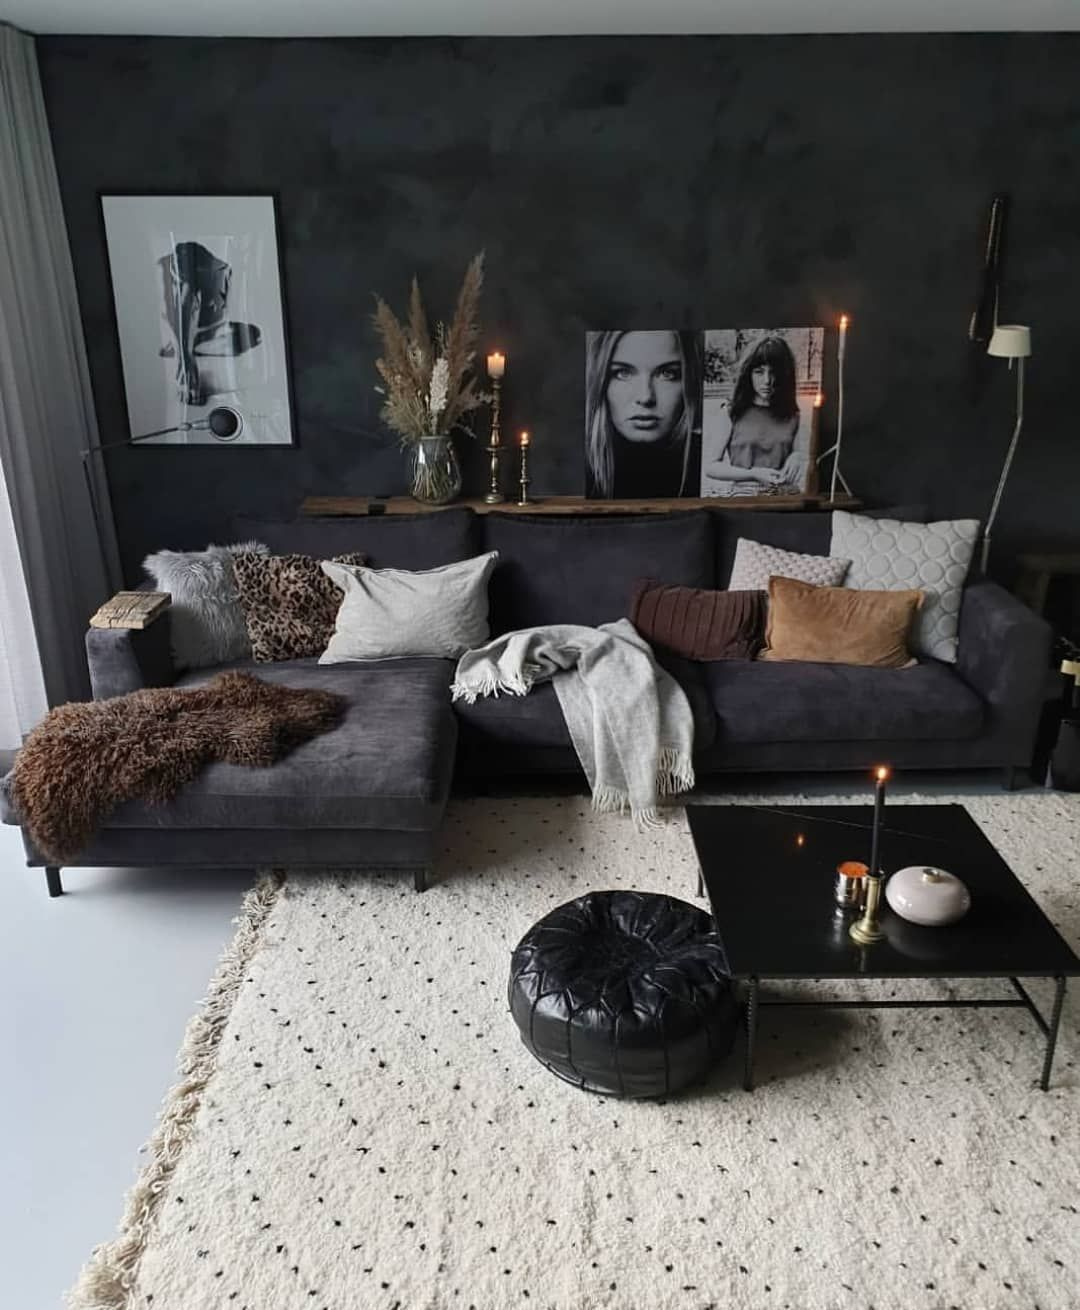 Home Decor Design On Instagram Who Loves Black Dark Interior This Living Room Has Something Classy Yet Giv In 2020 Dark Interiors Home Decor Apartment Decor